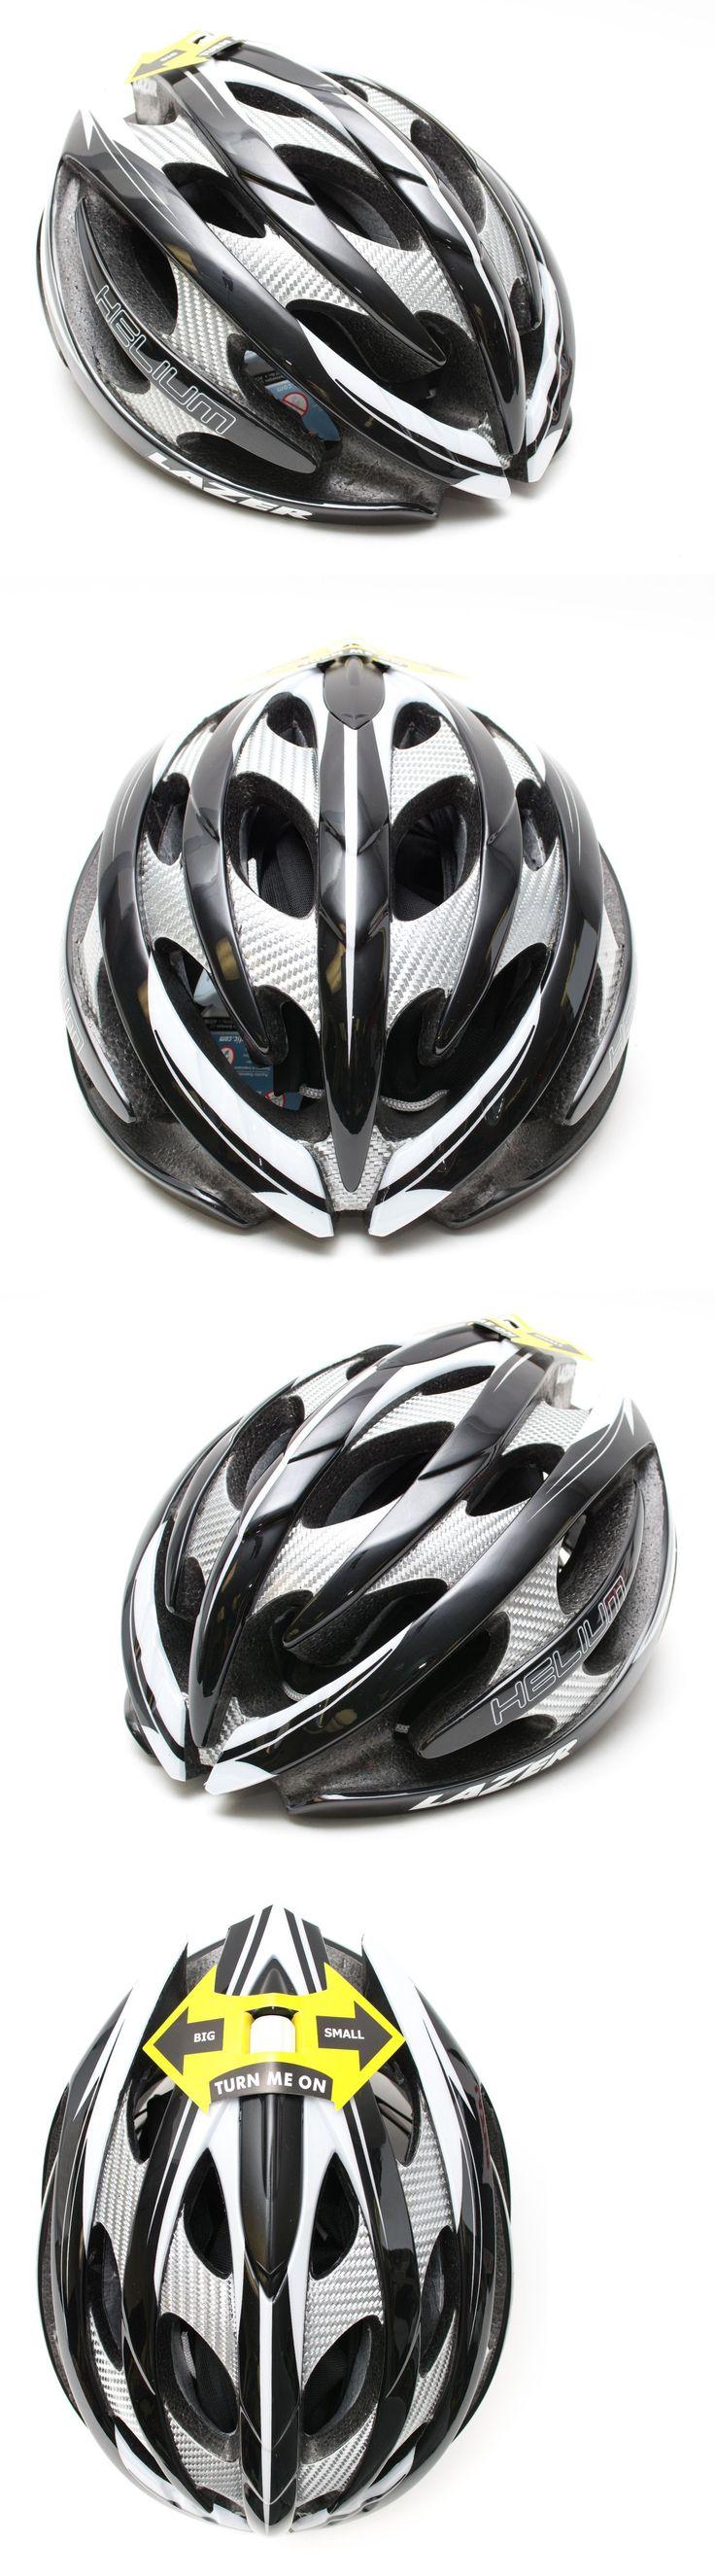 Helmets 70911: Lazer Helium Road Mountain Cyclocross Bike Helmet Adjustable M-L Black/White New BUY IT NOW ONLY: $59.95